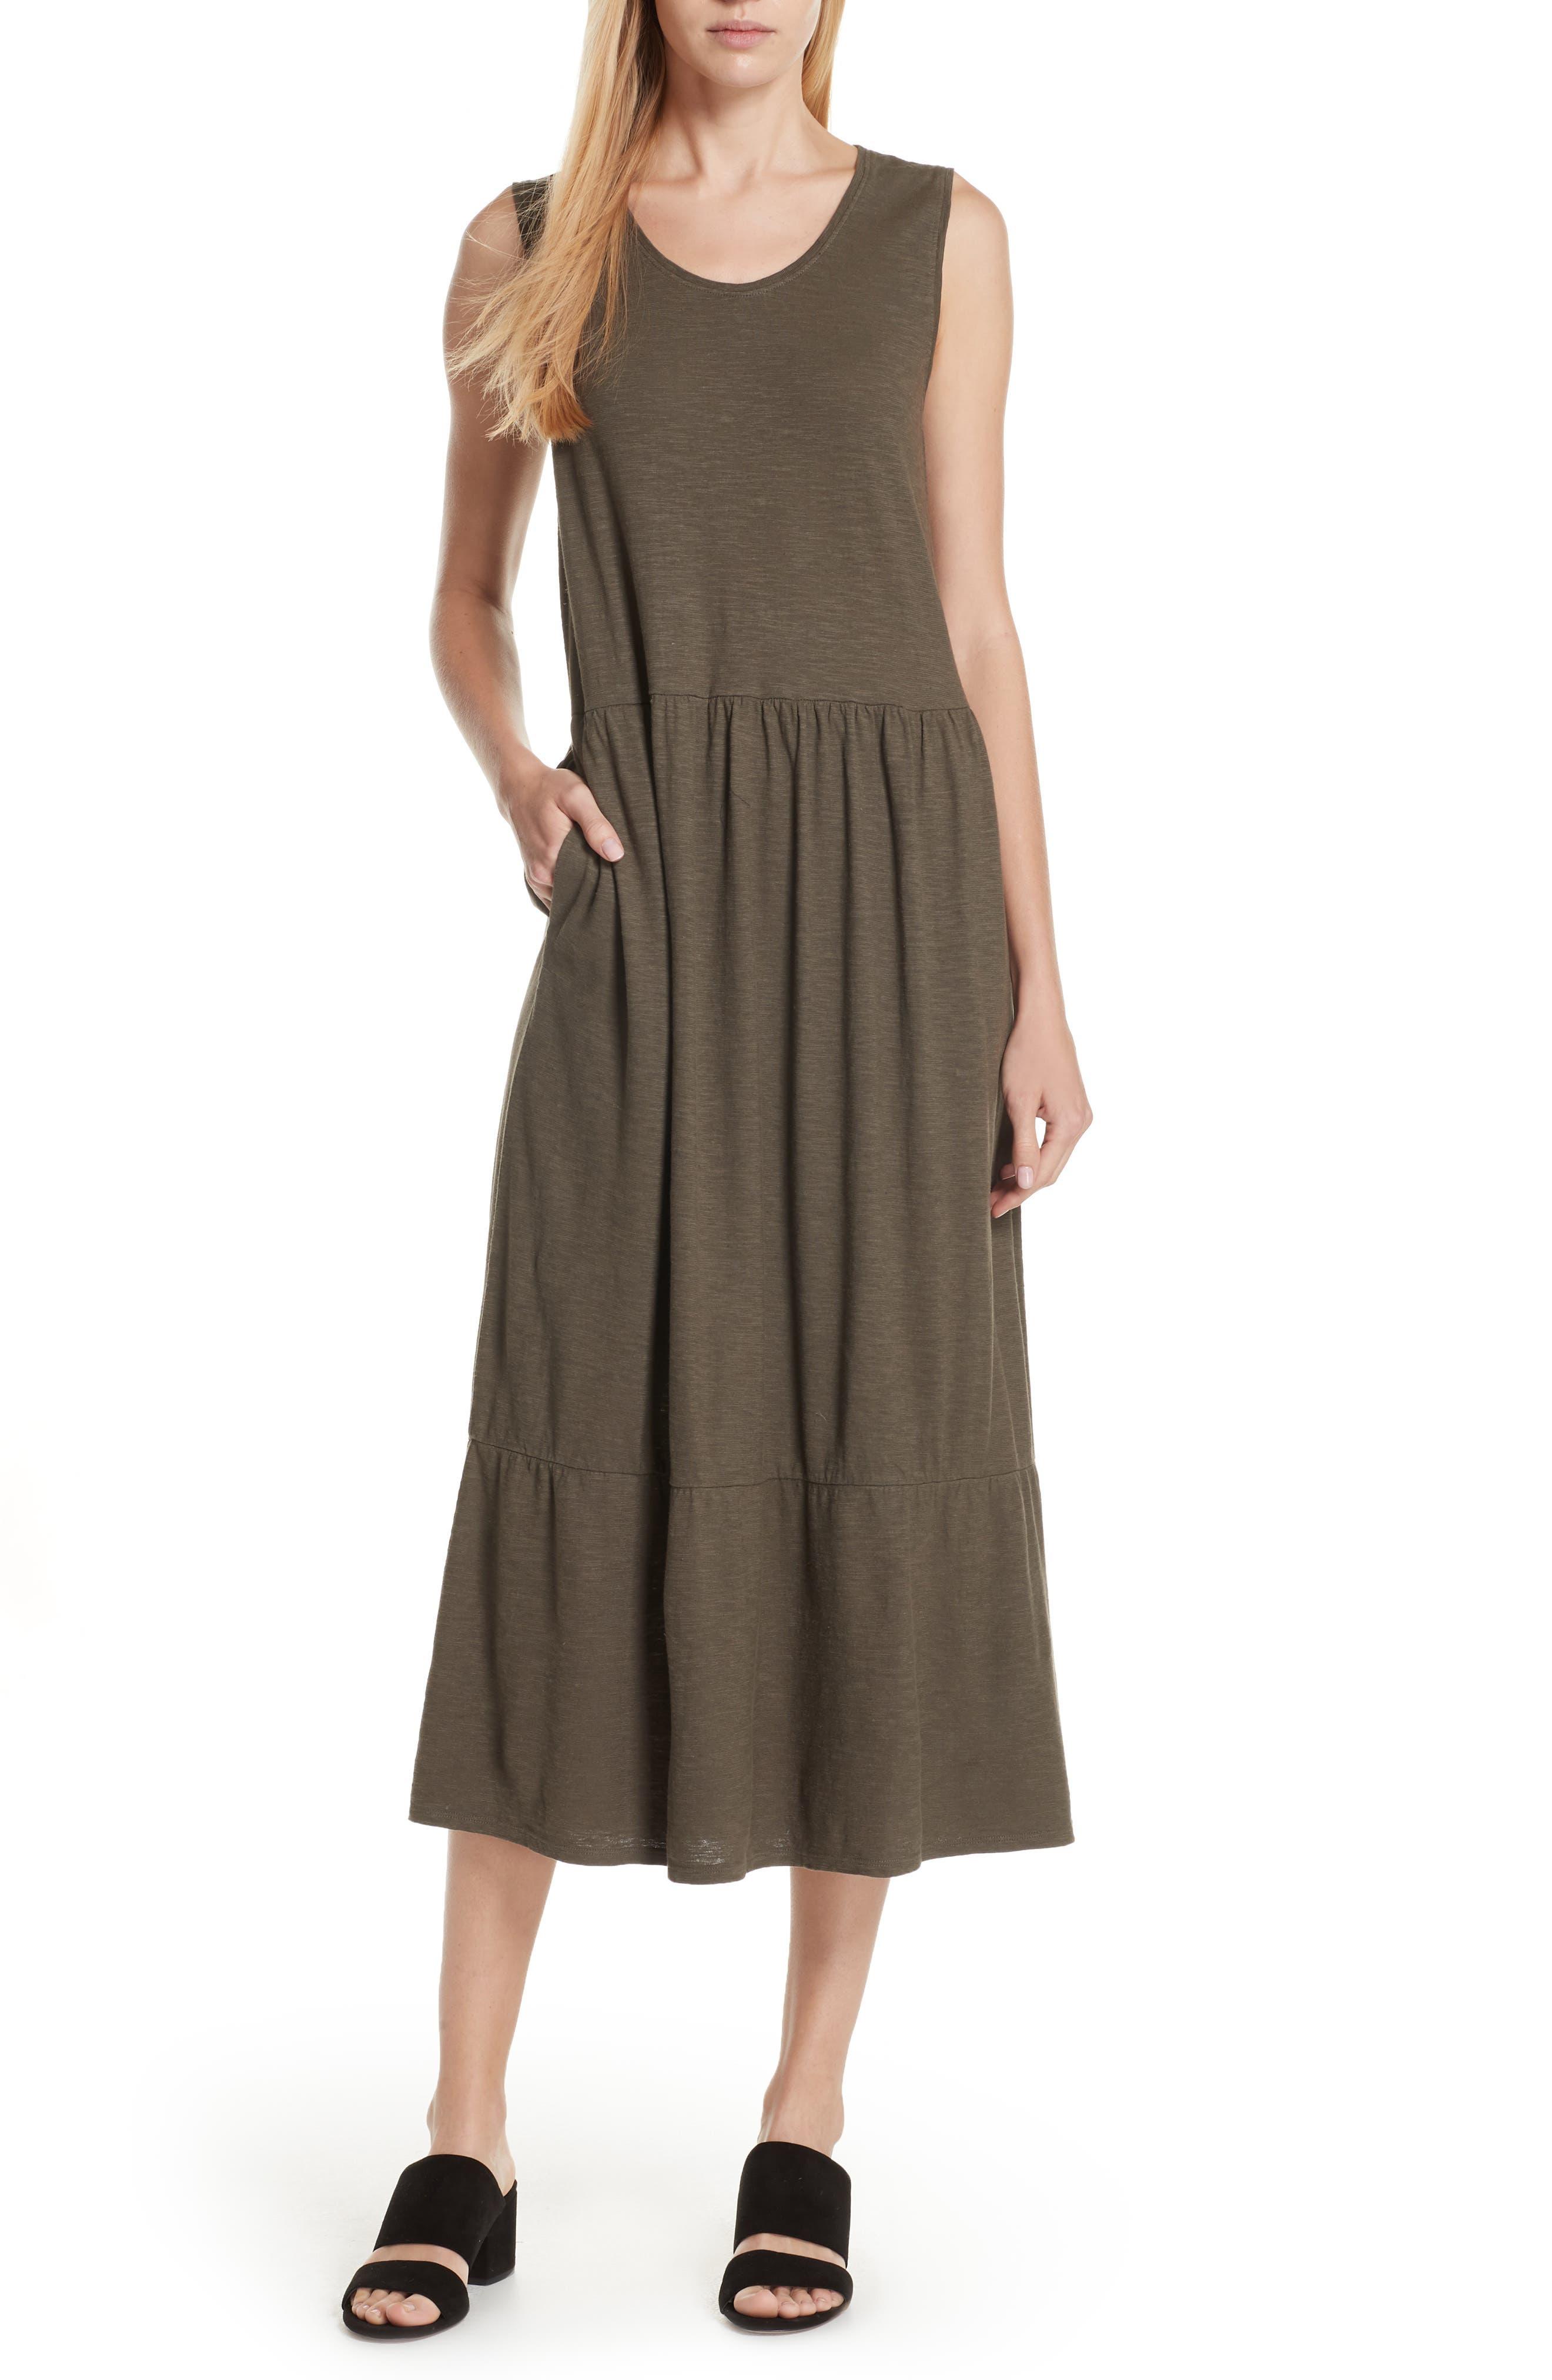 Eileen Fisher Scooped Neck Hemp & Cotton Midi Dress (Regular & Petite)